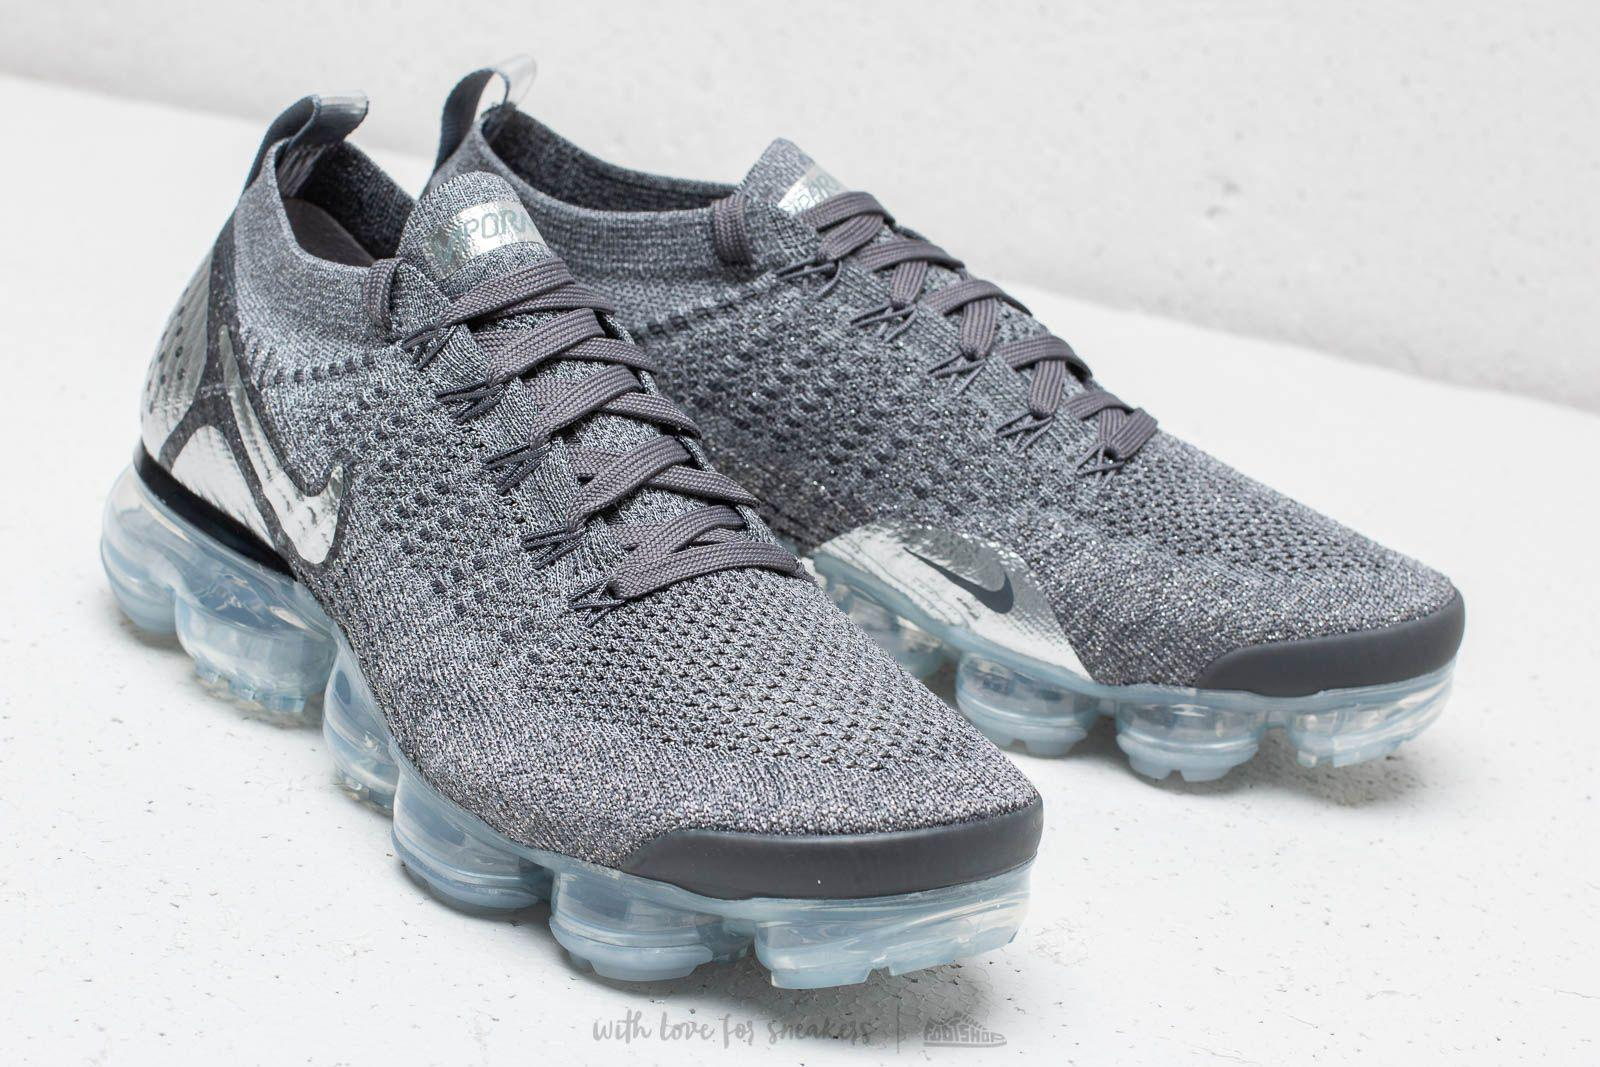 6cdebcb5f67 Lyst - Nike Air Vapormax Flyknit 2 Dark Grey  Chrome-dark Grey in ...